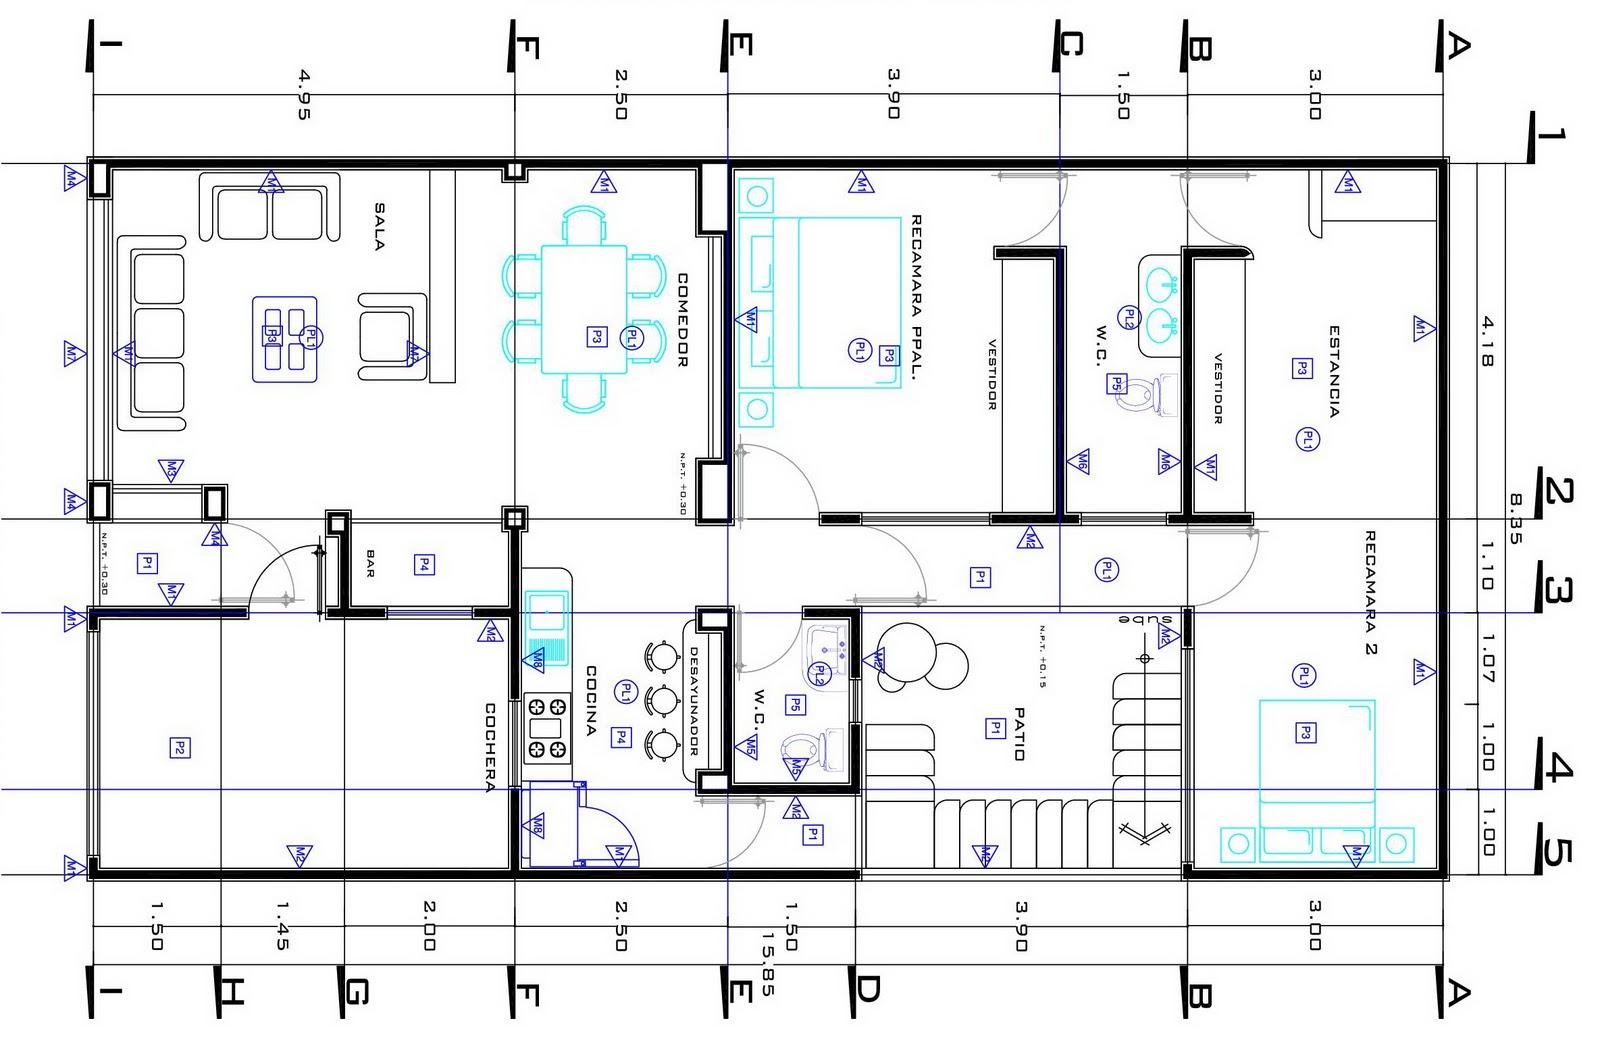 Pin planta arquitectonica on pinterest for Planta arquitectonica pdf